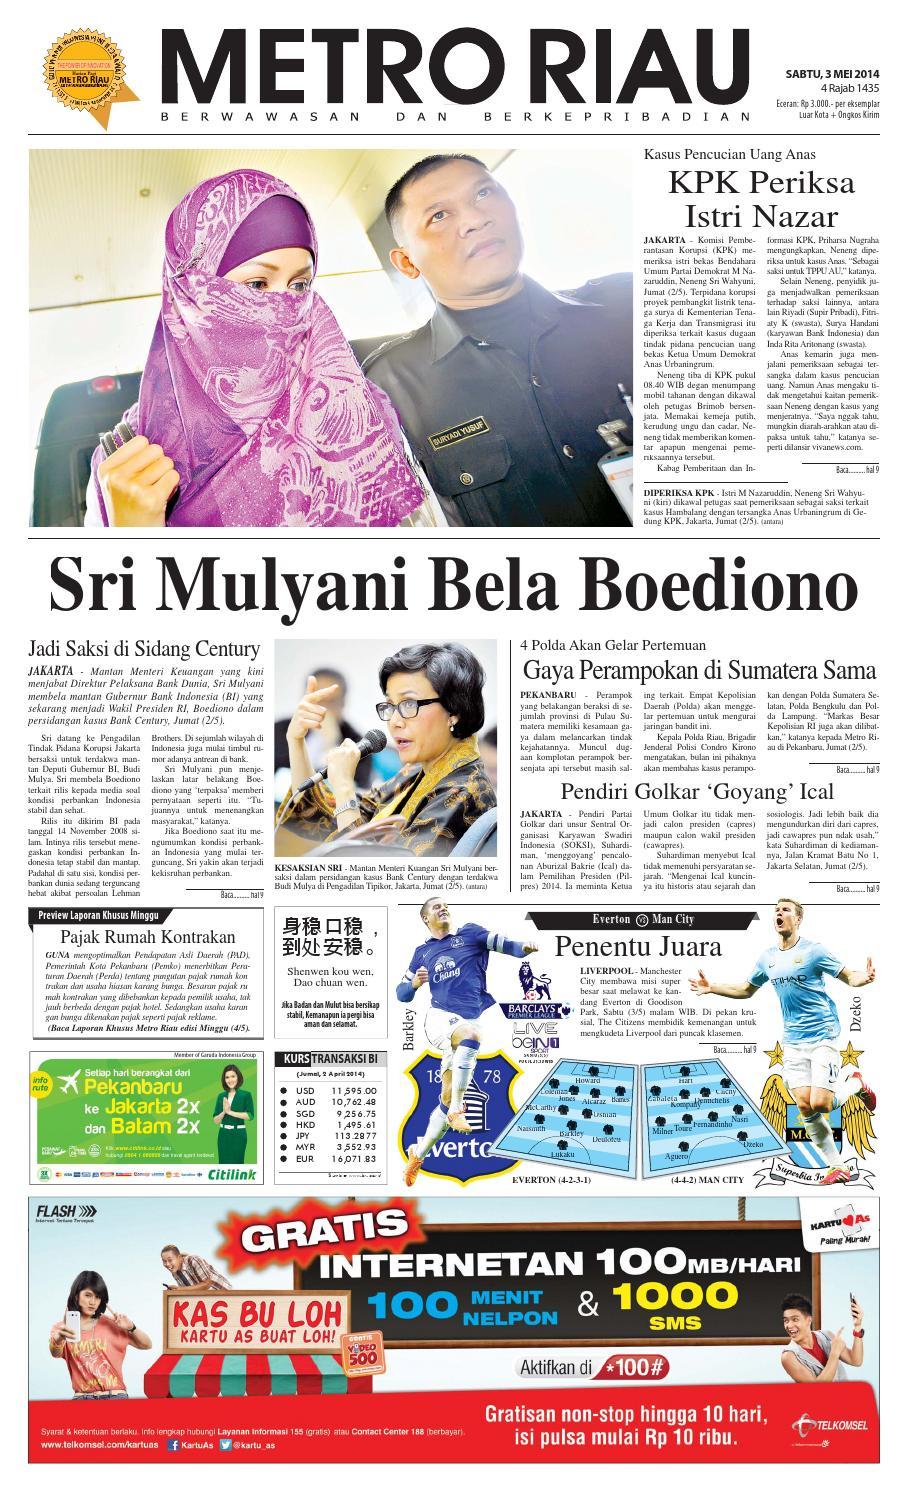 030514 By Harian Pagi Metro Riau Issuu Peci Beringin Jaya Pad